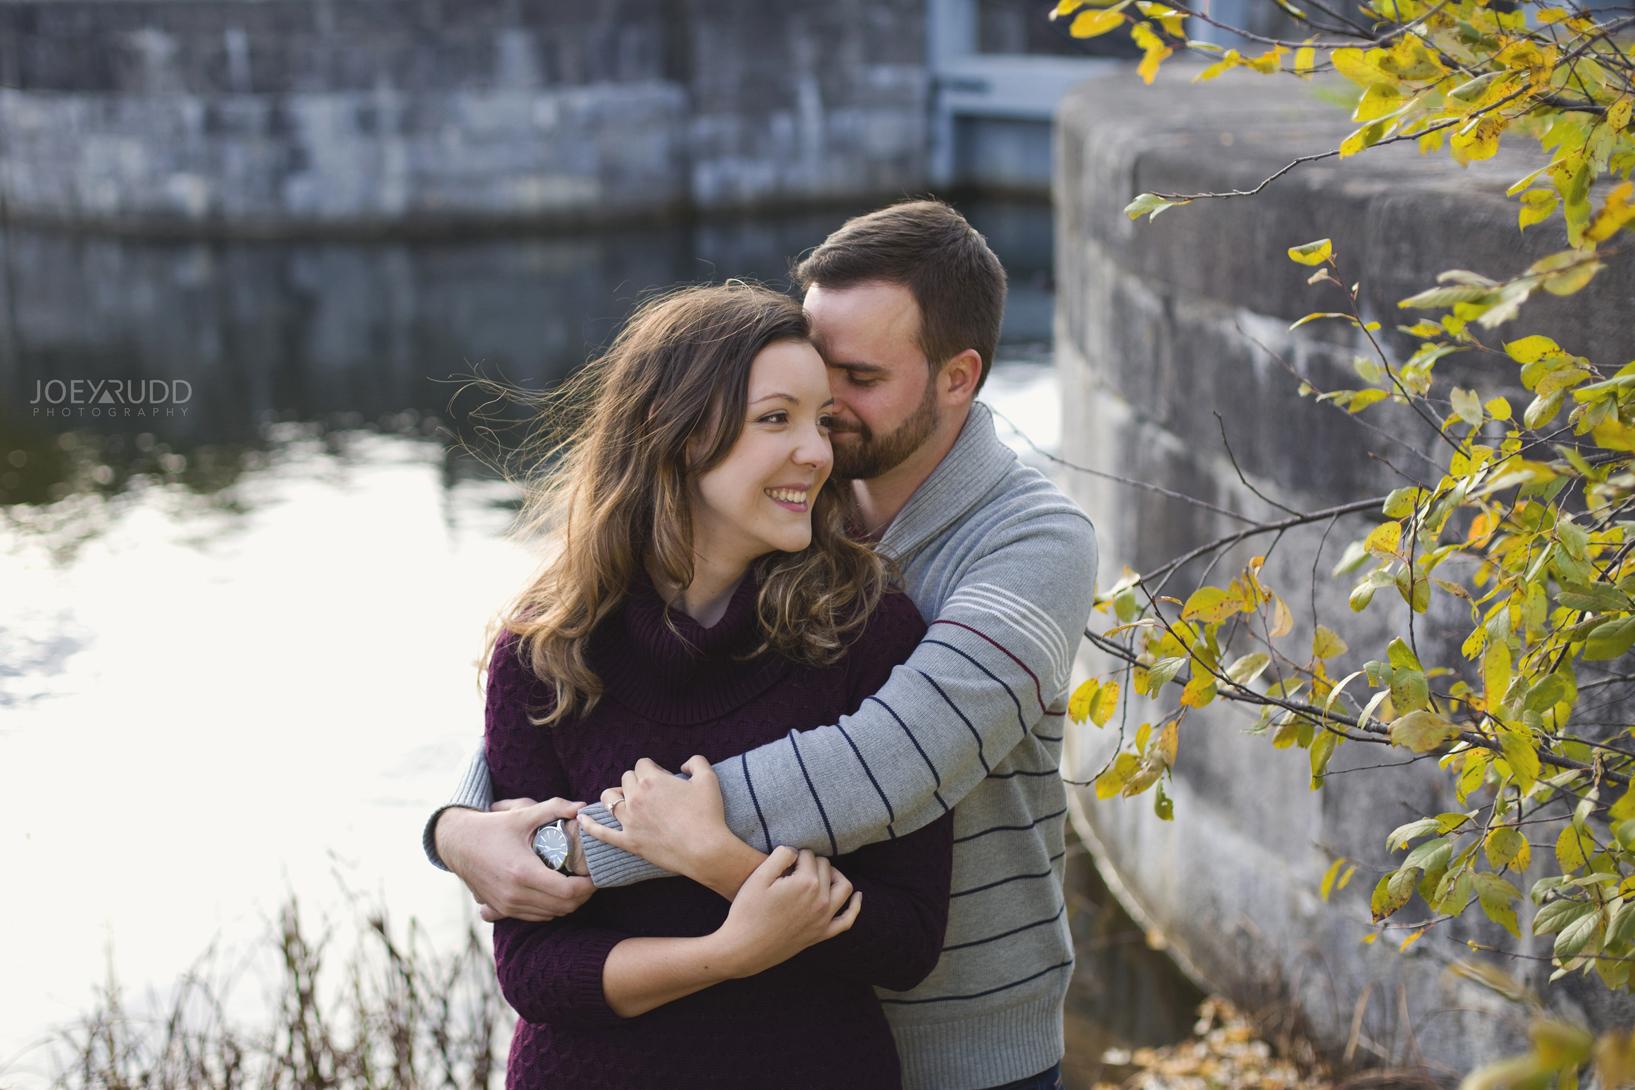 Smiths Falls Engagement Photography by Ottawa Wedding Photographer Joey Rudd Photography